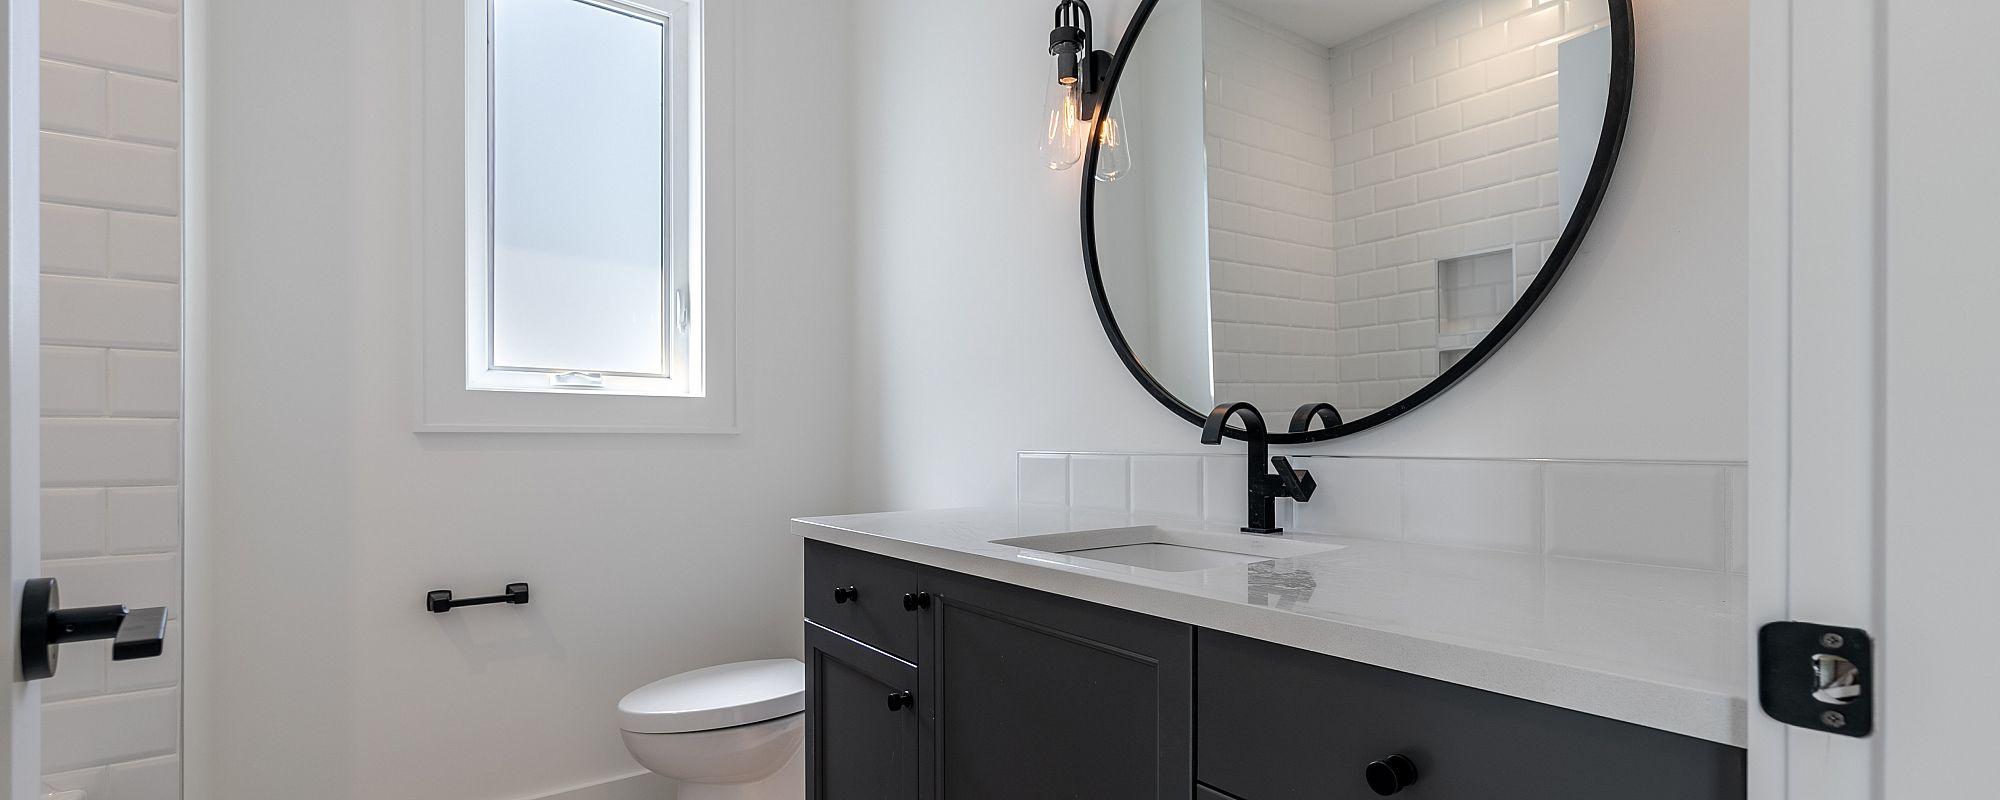 Stark Homes custom bathroom with circular black framed mirror and dark cabinets